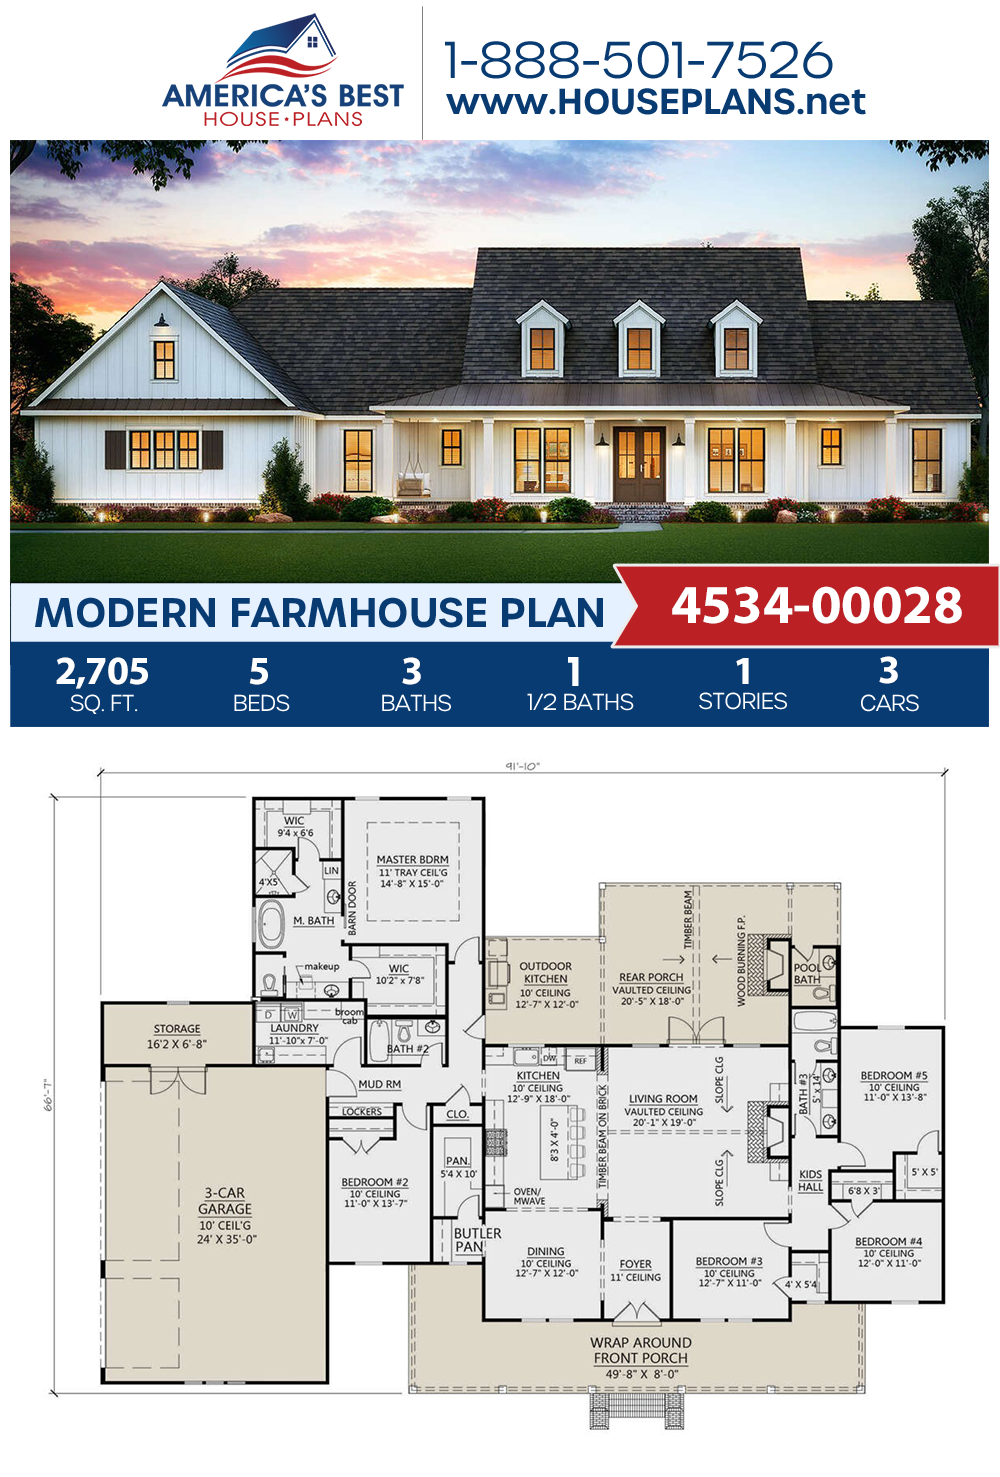 House Plan 4534 00028 Modern Farmhouse Plan 2 705 Square Feet 5 Bedrooms 3 5 Bathrooms House Blueprints Modern Farmhouse Plans House Plans Farmhouse